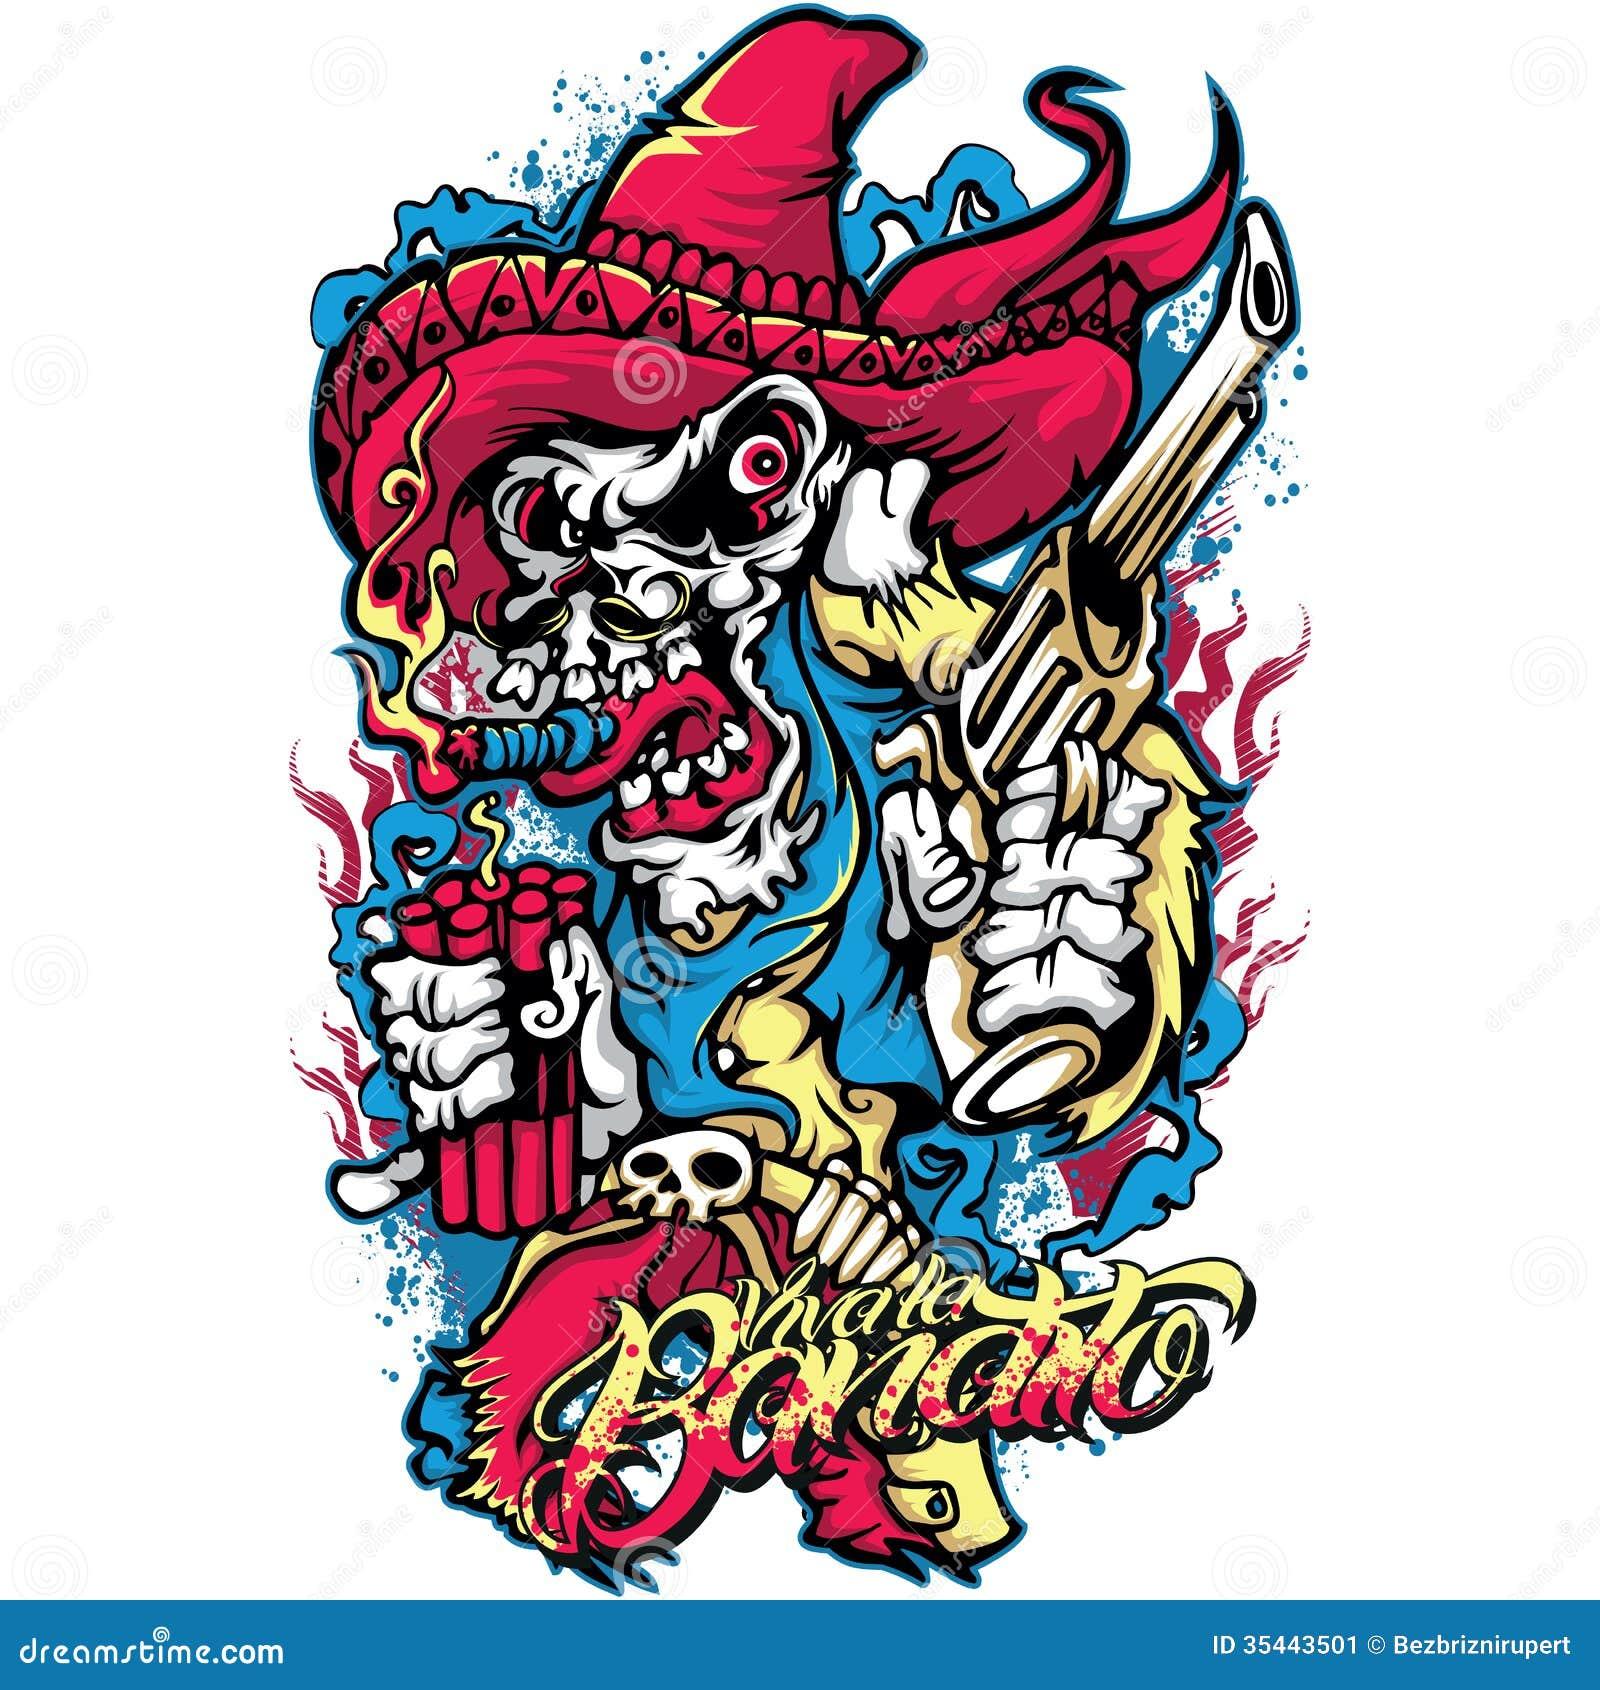 T shirt design download - Mexican Bandit